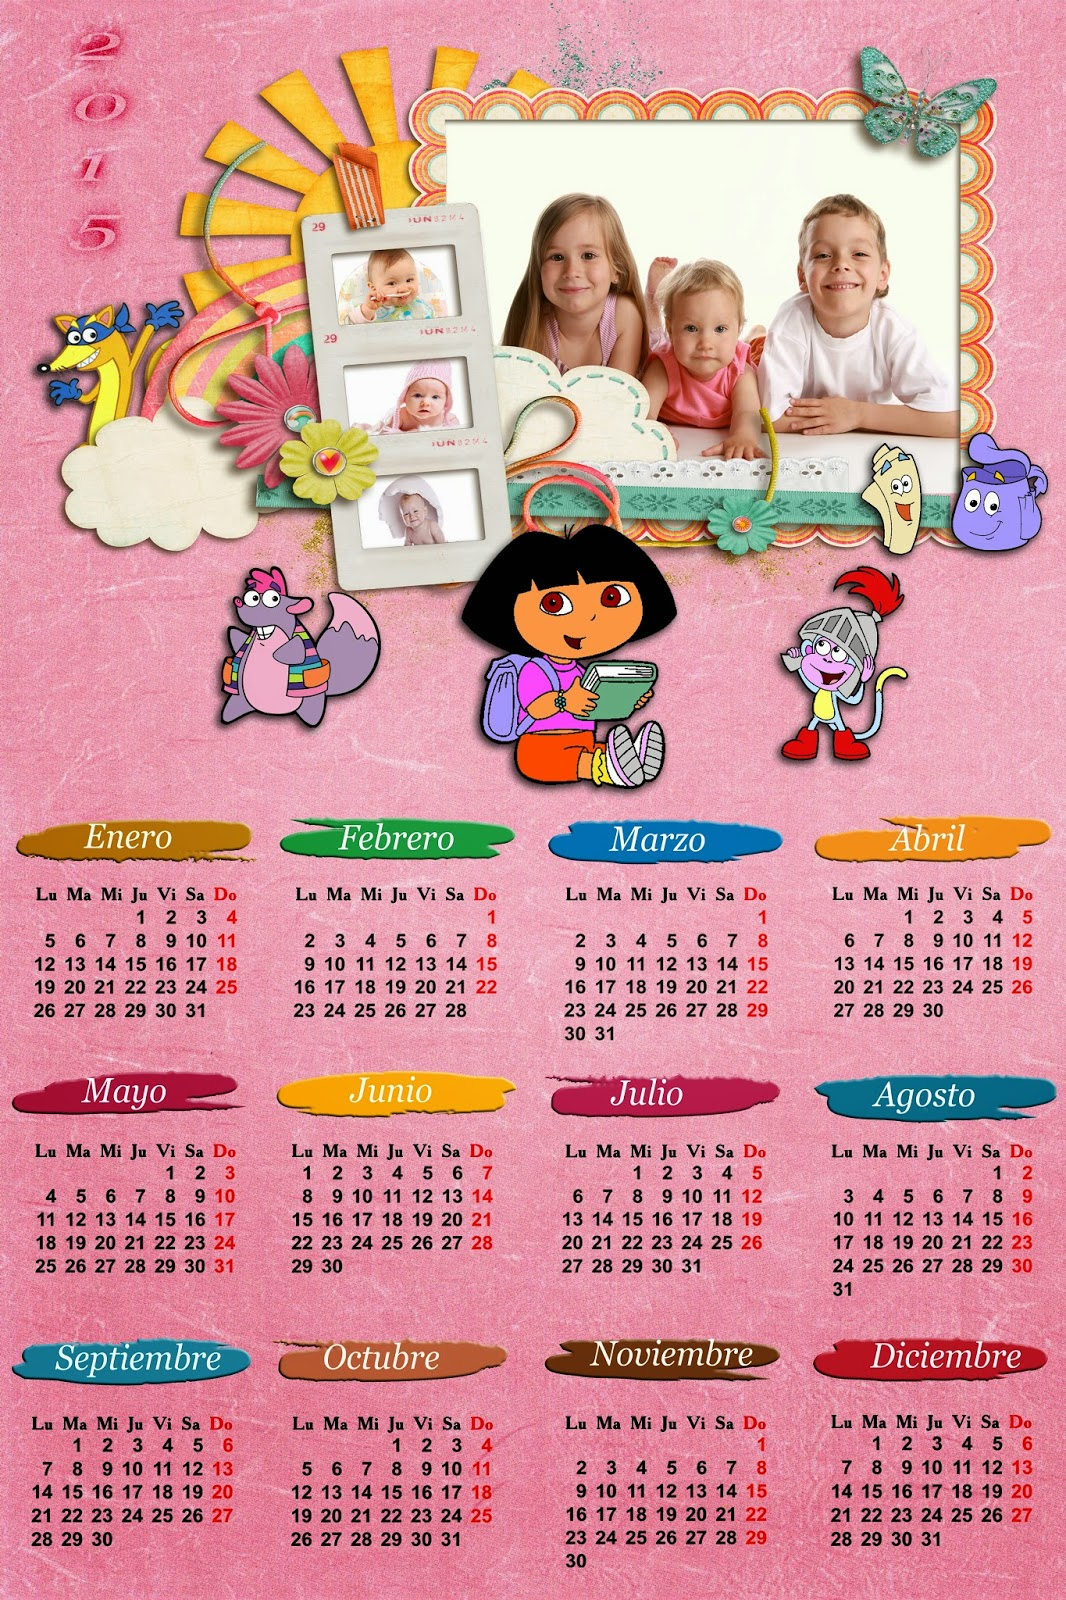 Calendario infantil 2015 Dora la exploradora para Photoshop (Psd+Png)